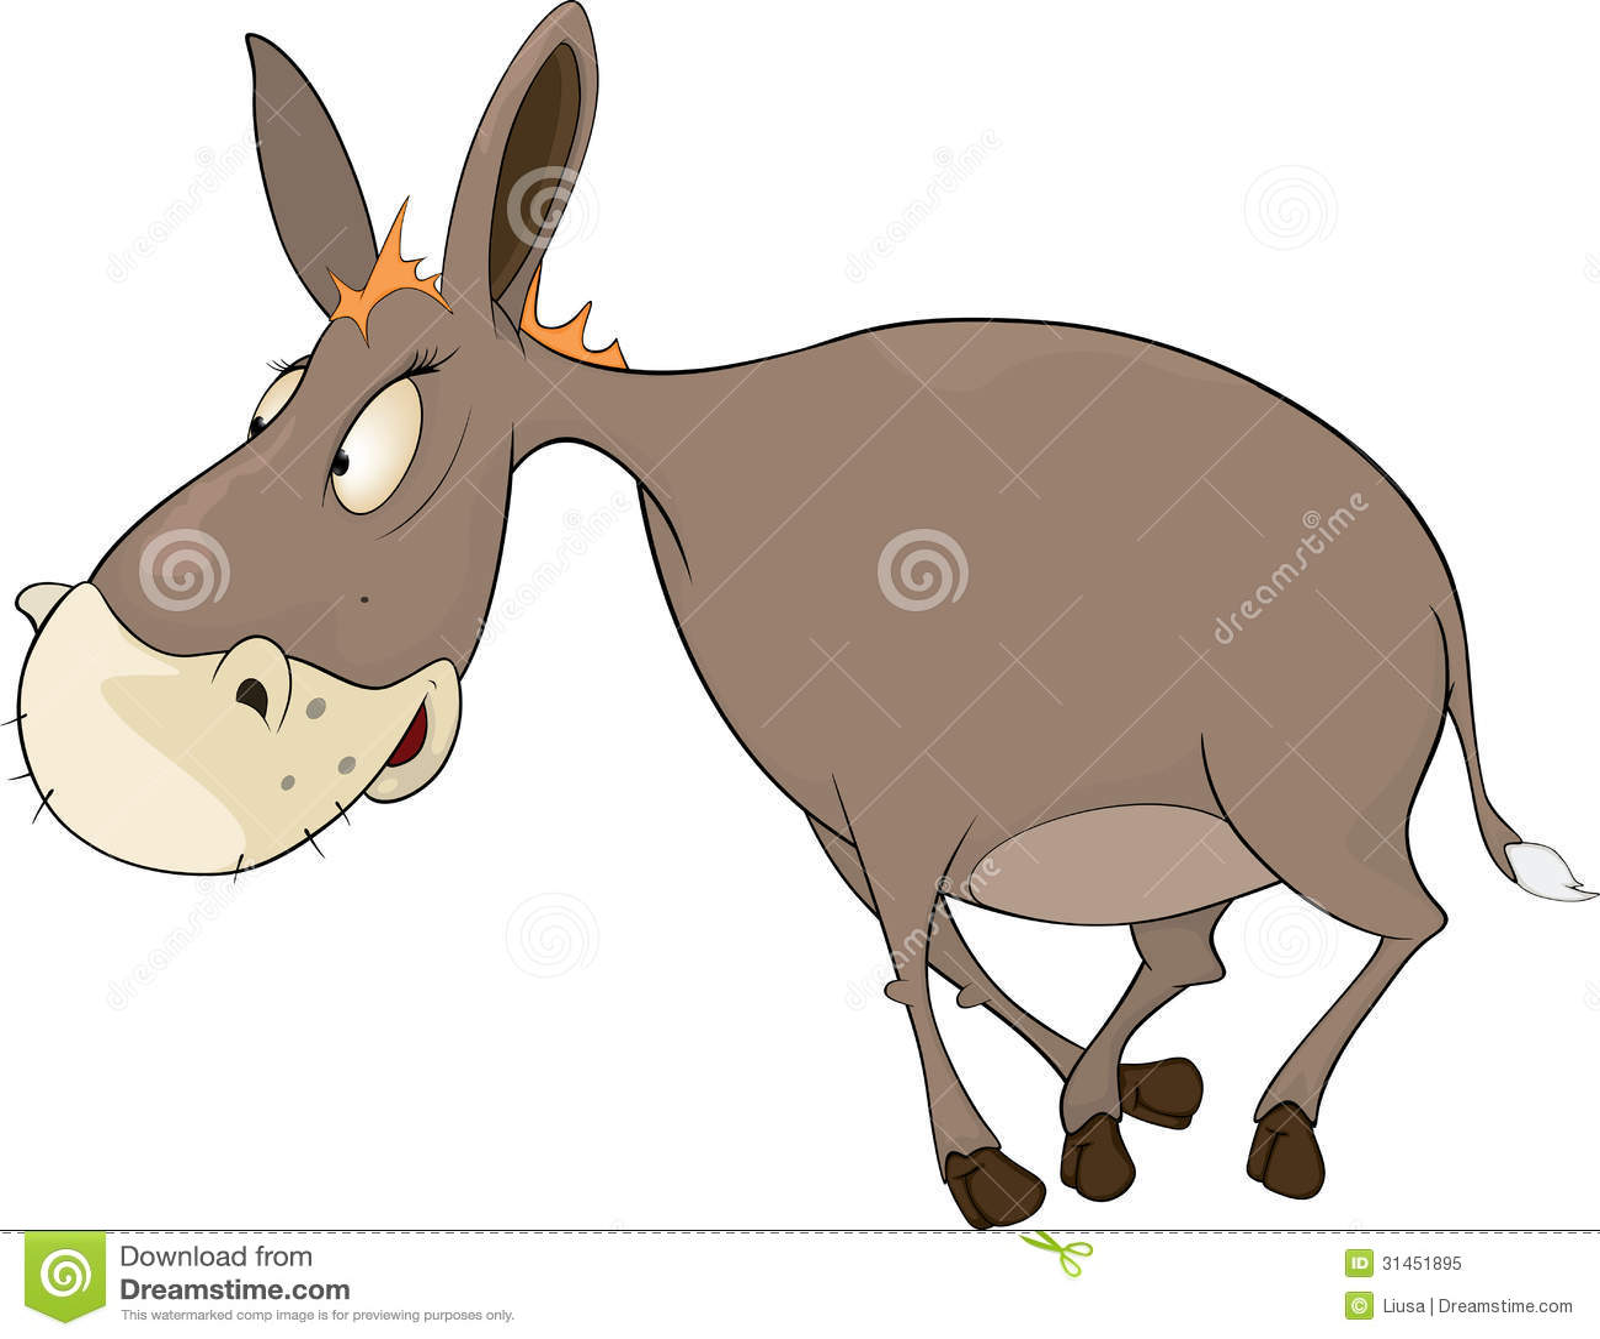 image Ridículo asno burro redbone con jiggle p2